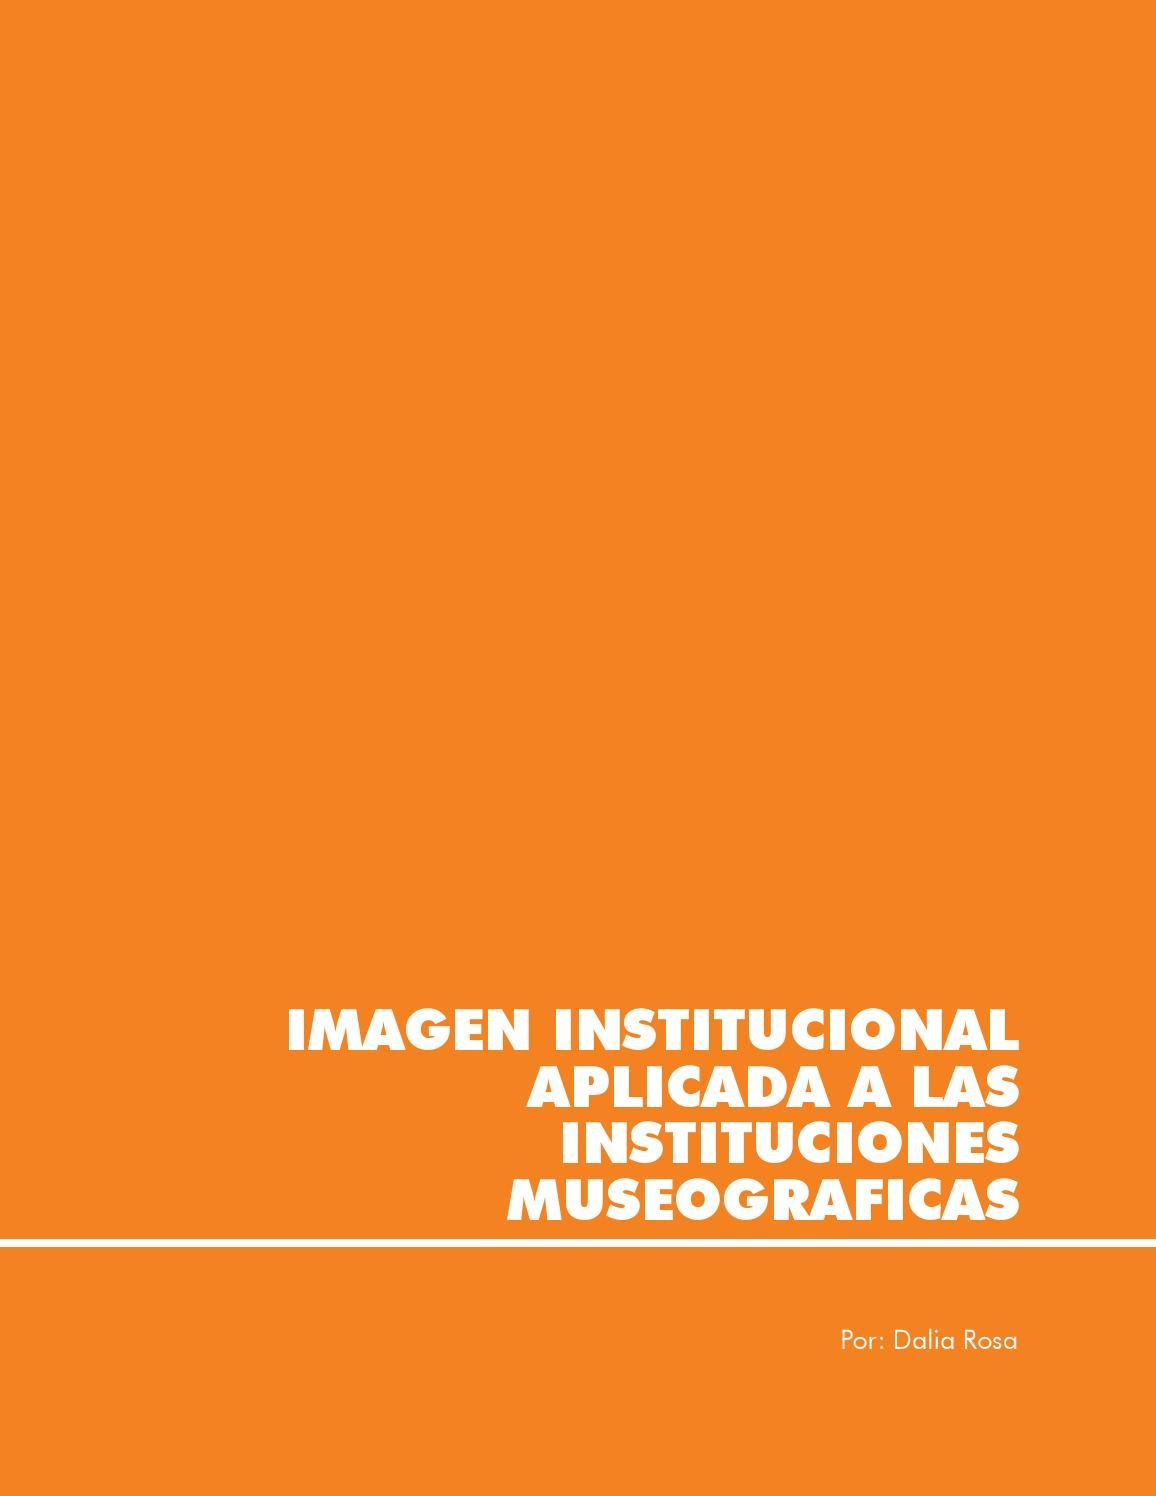 Imagen Institucional aplicada a museos - Dalia Rosa - El Salvador ...